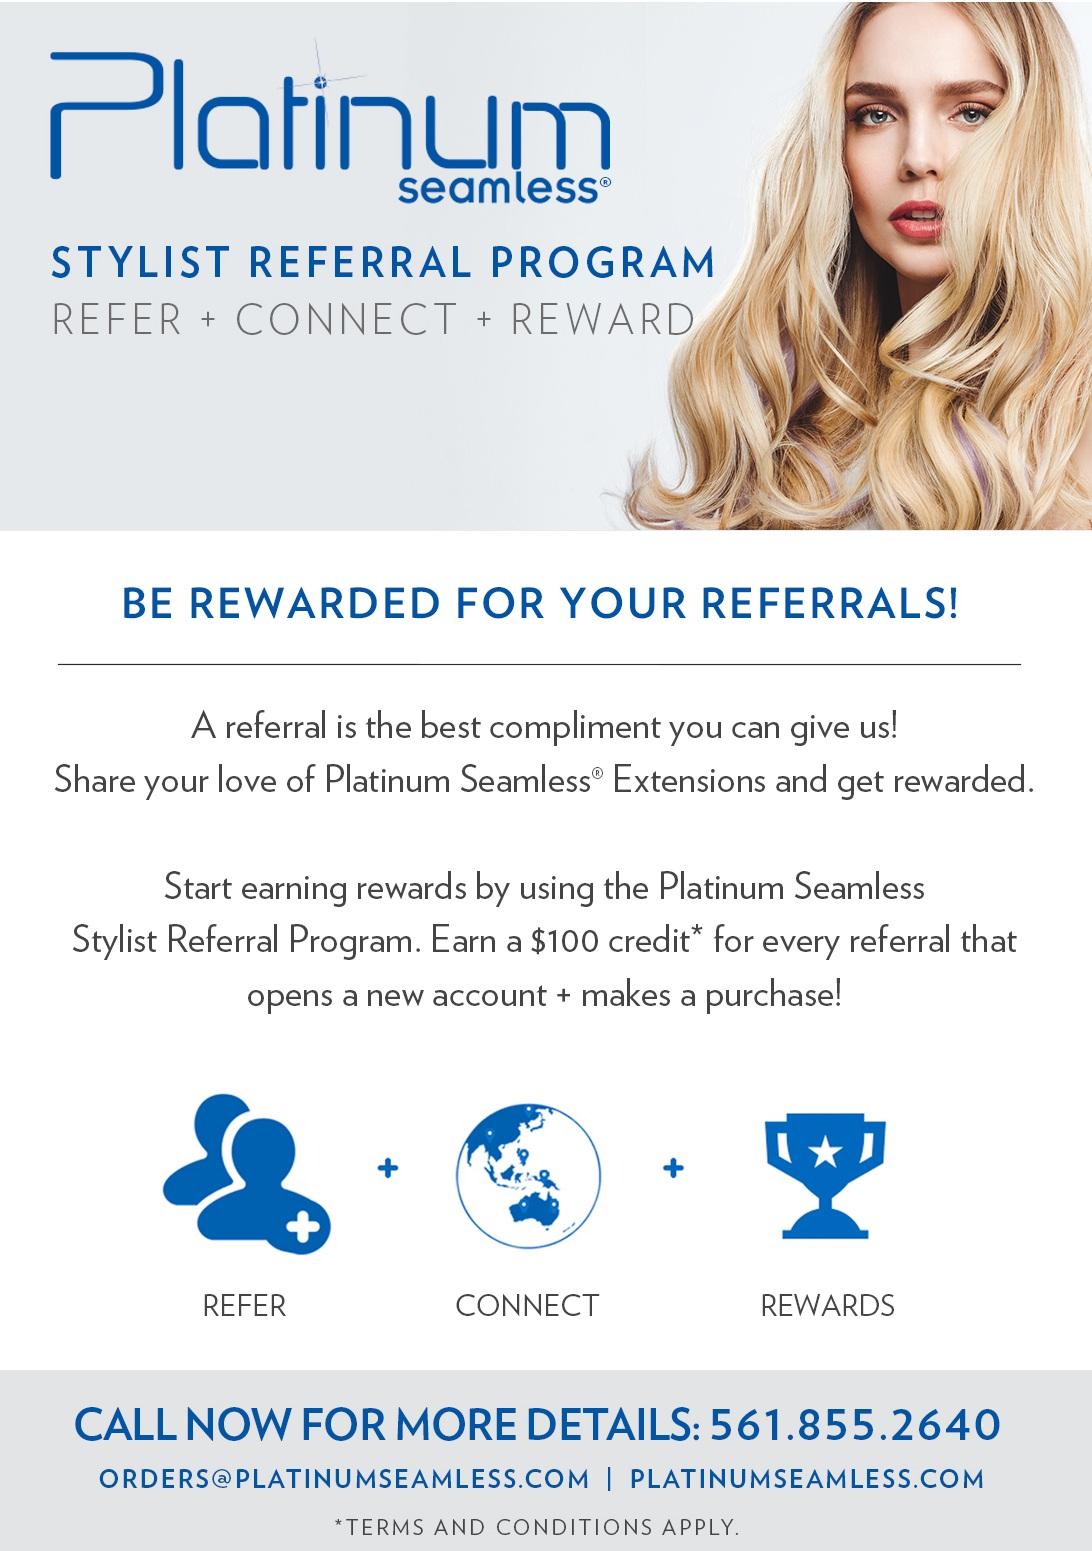 stylist_referral_program.jpg